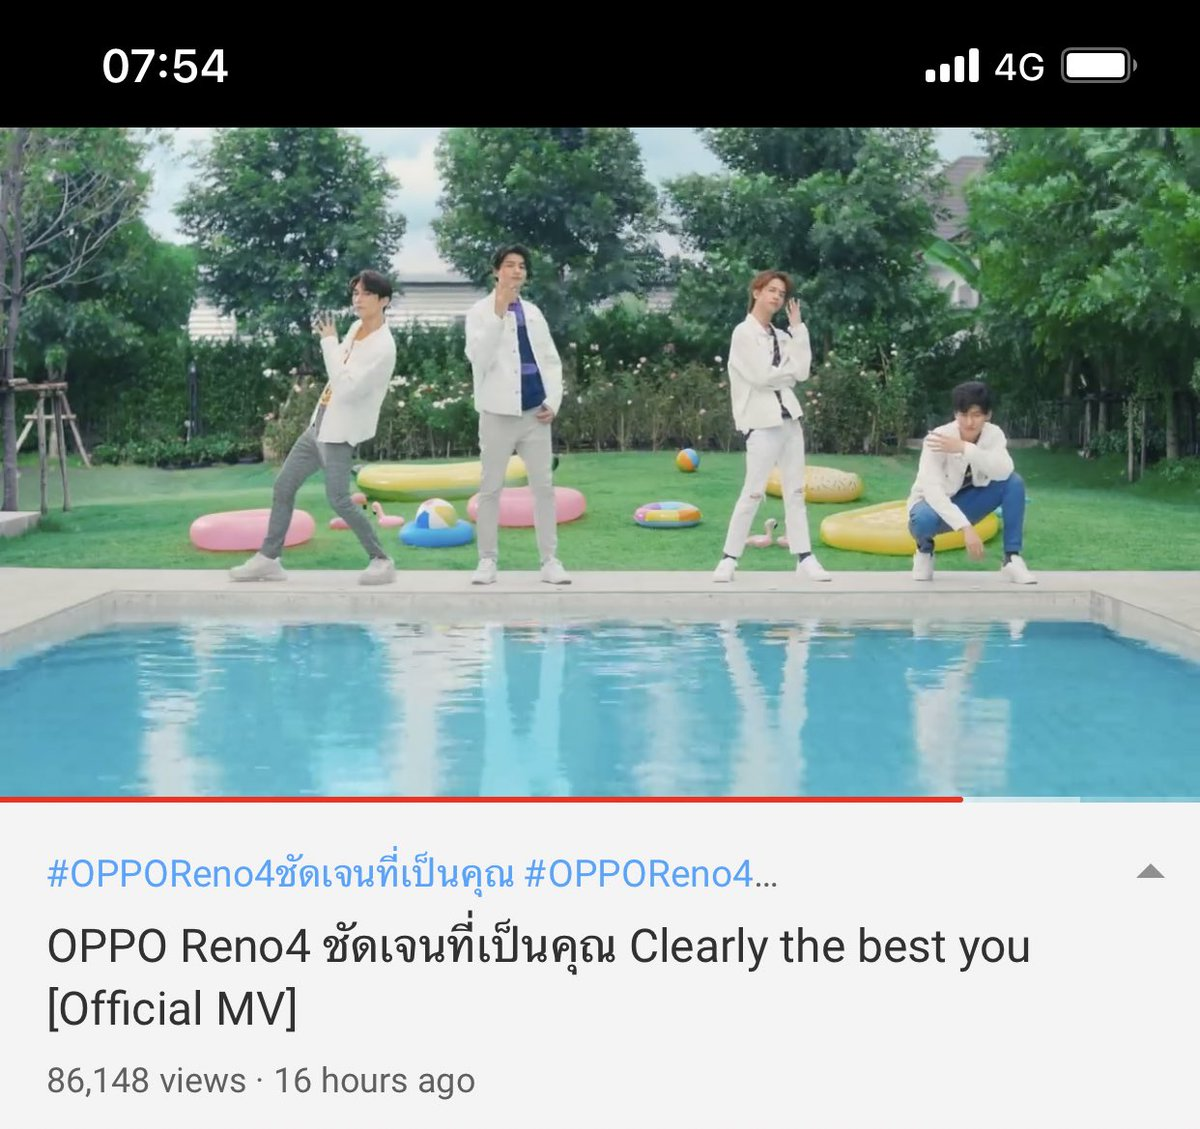 OPPO Reno4 ชัดเจนที่เป็นคุณ Clearly the best you [Official MV]   https://youtu.be/cyaRzaiyL-8   #MewGulf #OhmFluke  #OPPOReno4ชัดเจนที่เป็นคุณpic.twitter.com/Bkj4WHDdw4